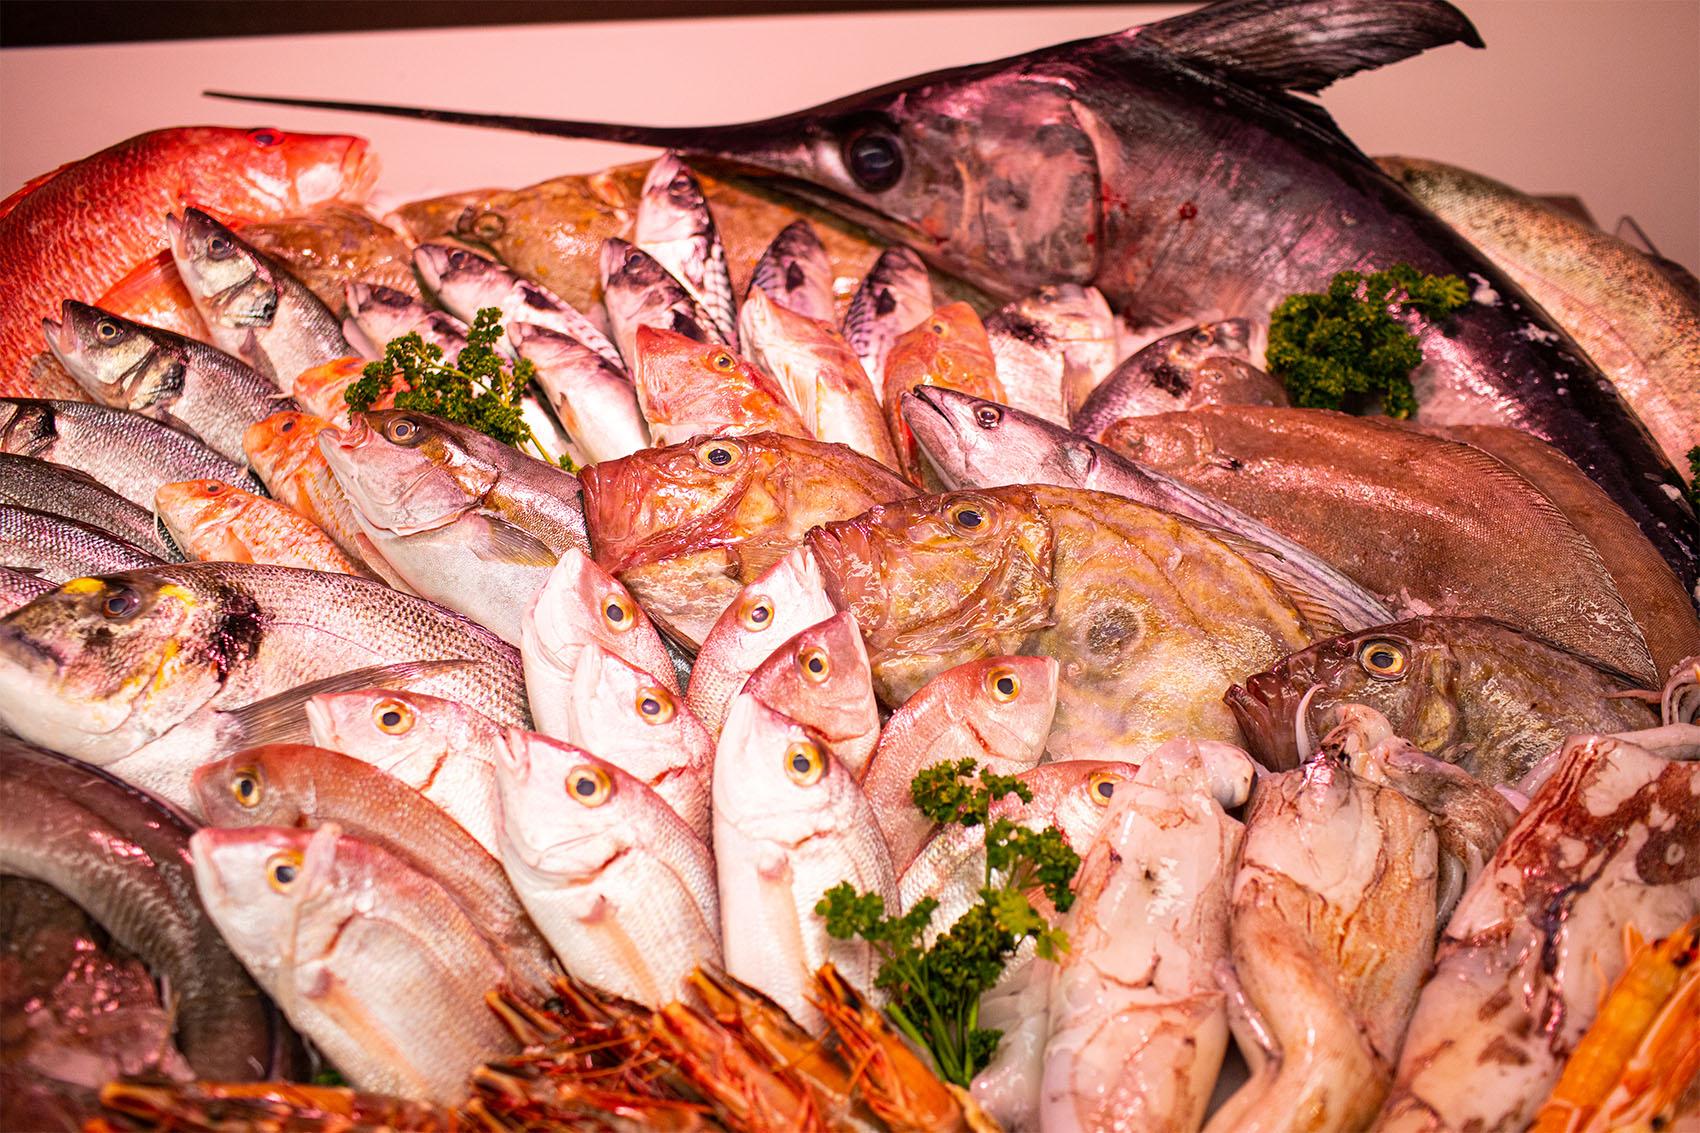 A wide range of fresh fish